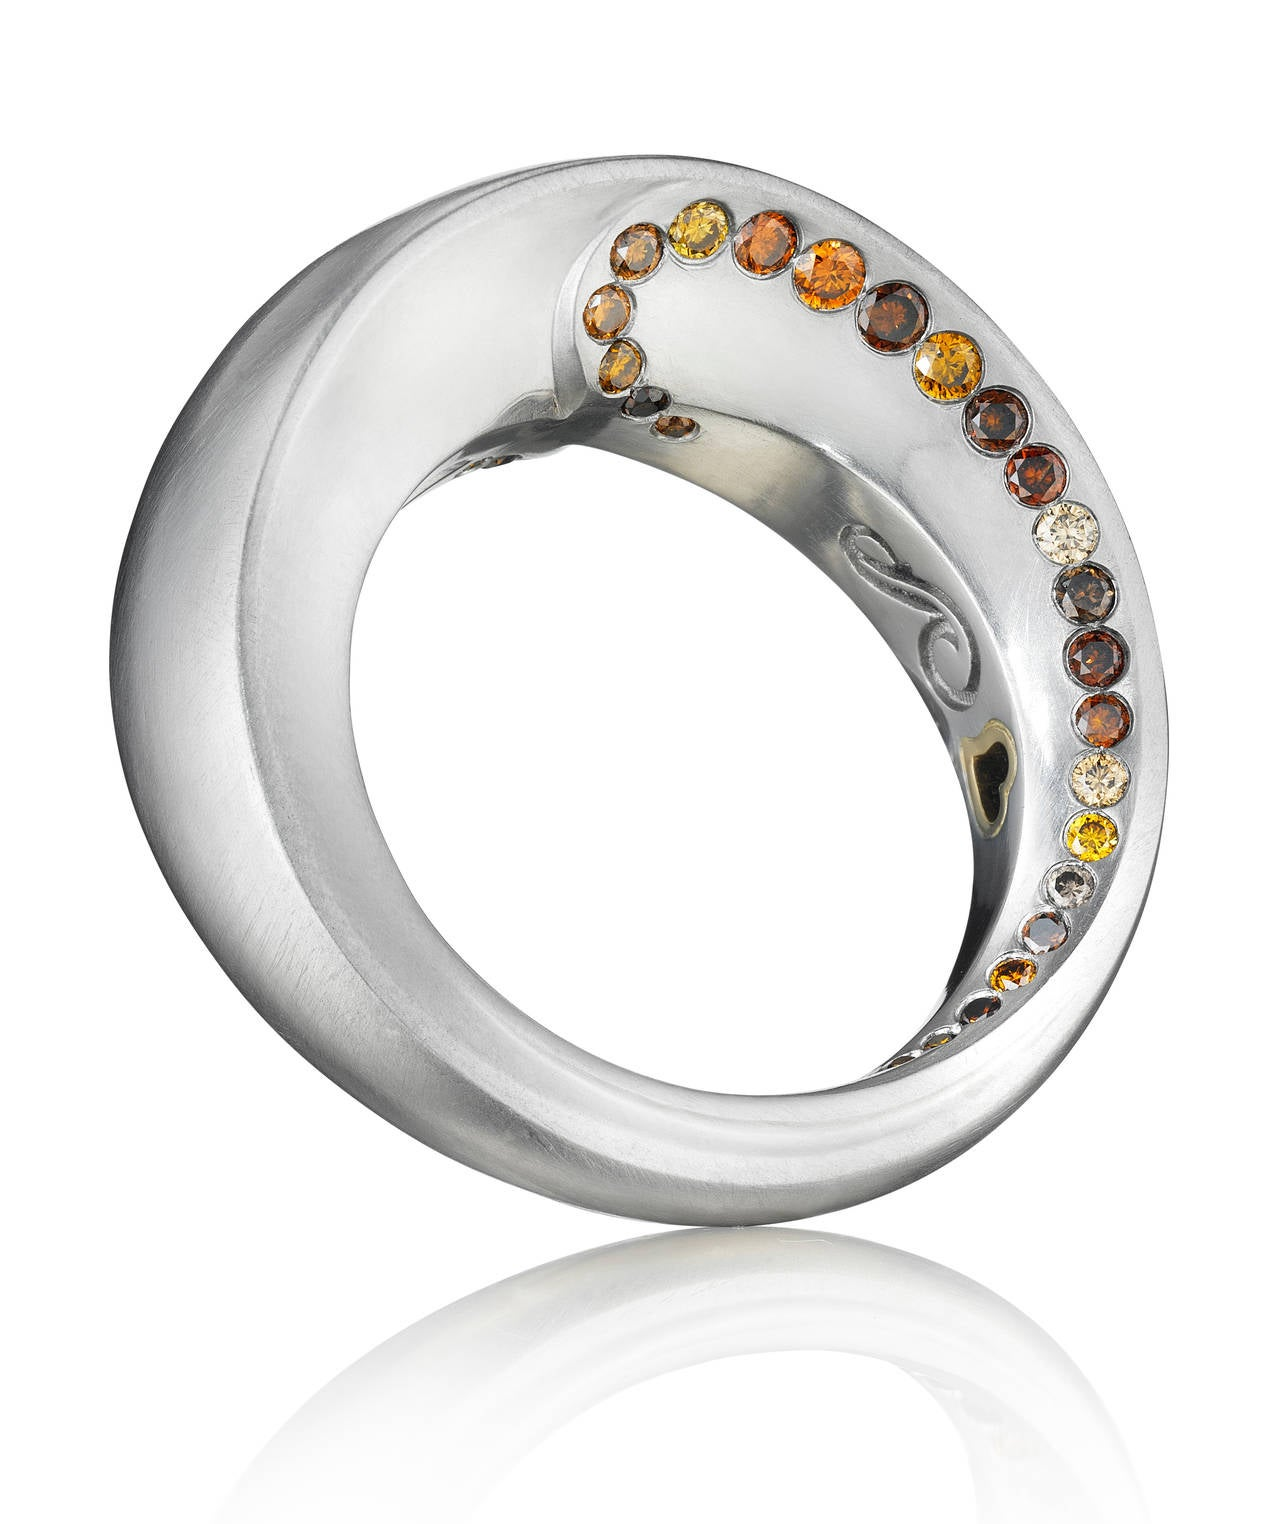 Modern Naomi Sarna Award-Winning Golden Orange Brown Diamond Platinum Ring For Sale